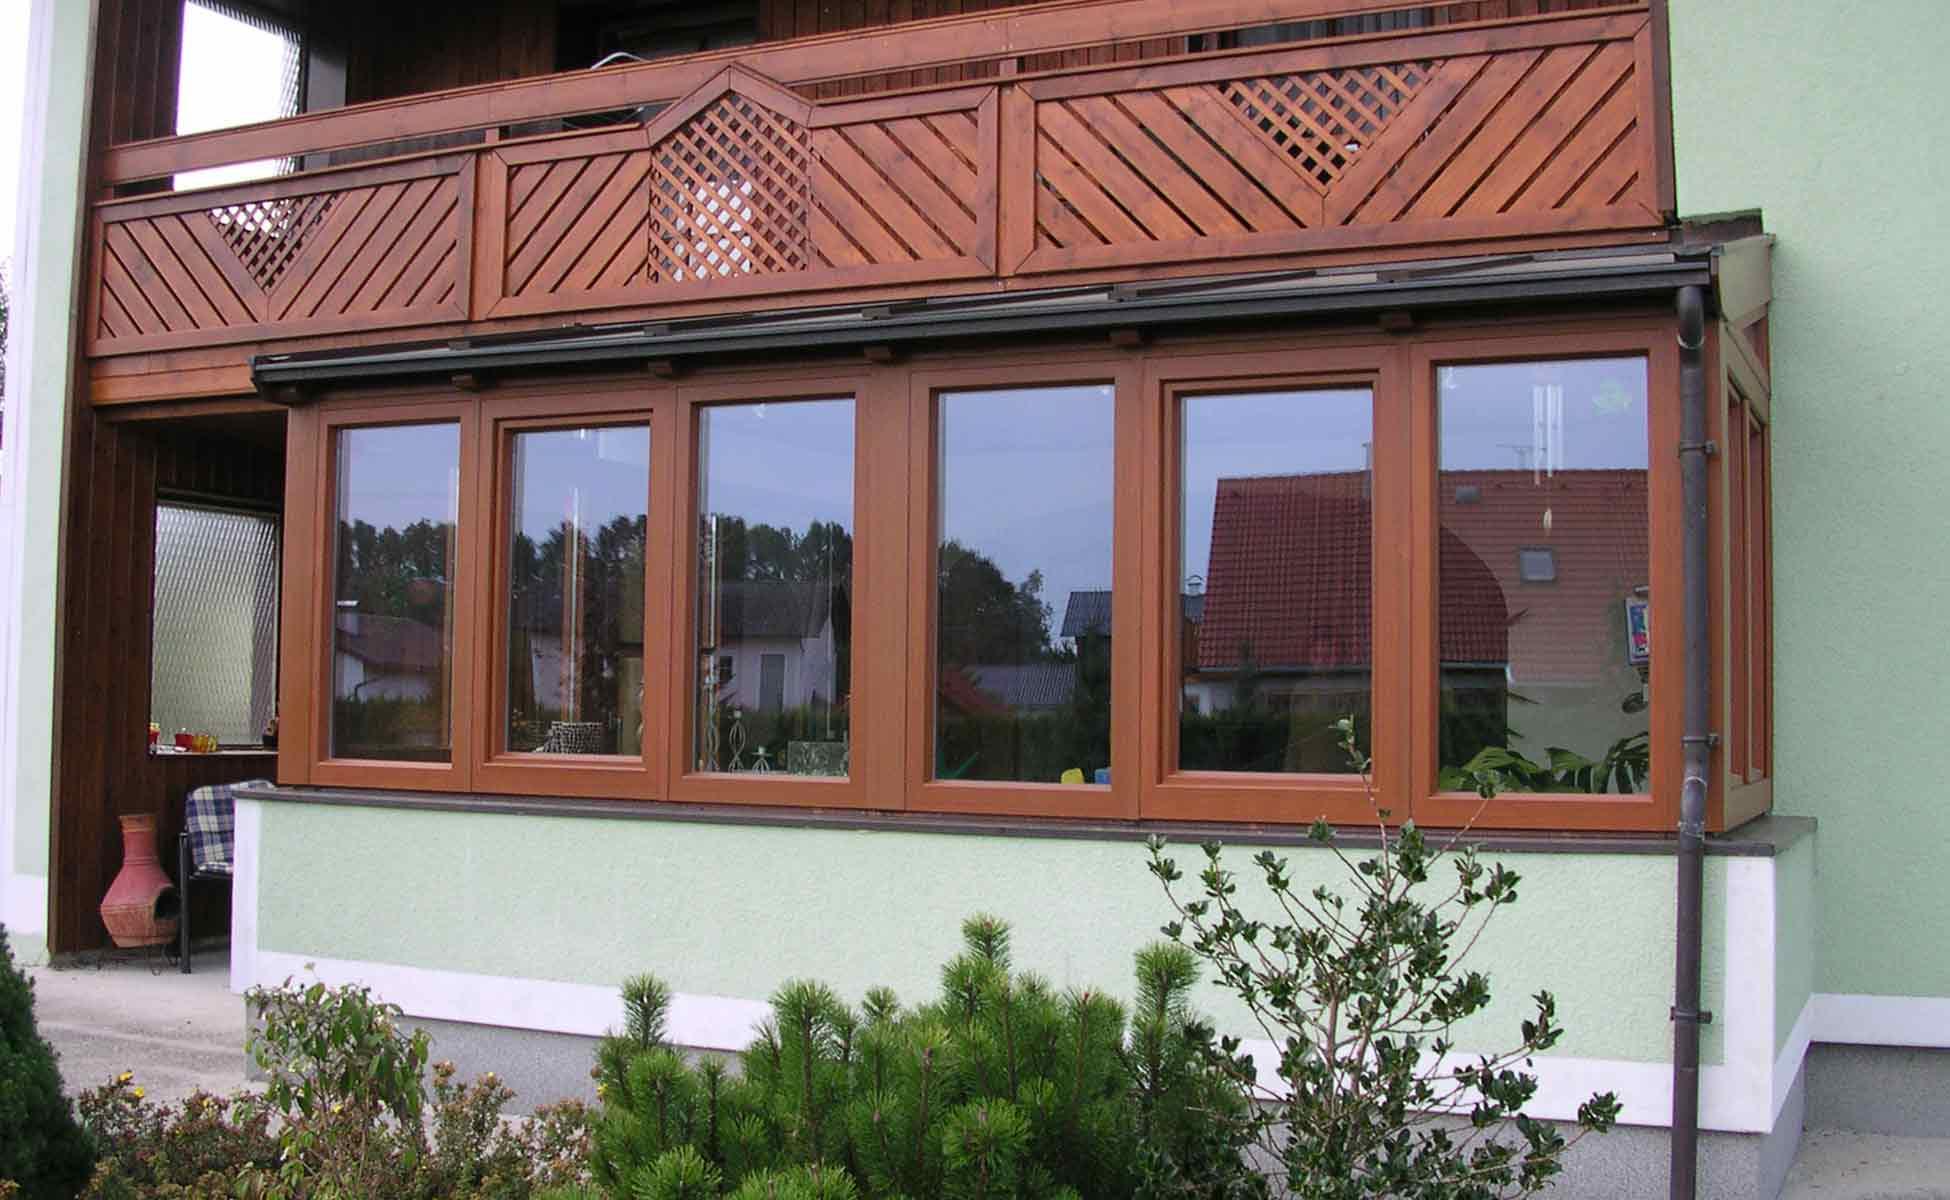 Fenstersanierung Alu-Profile